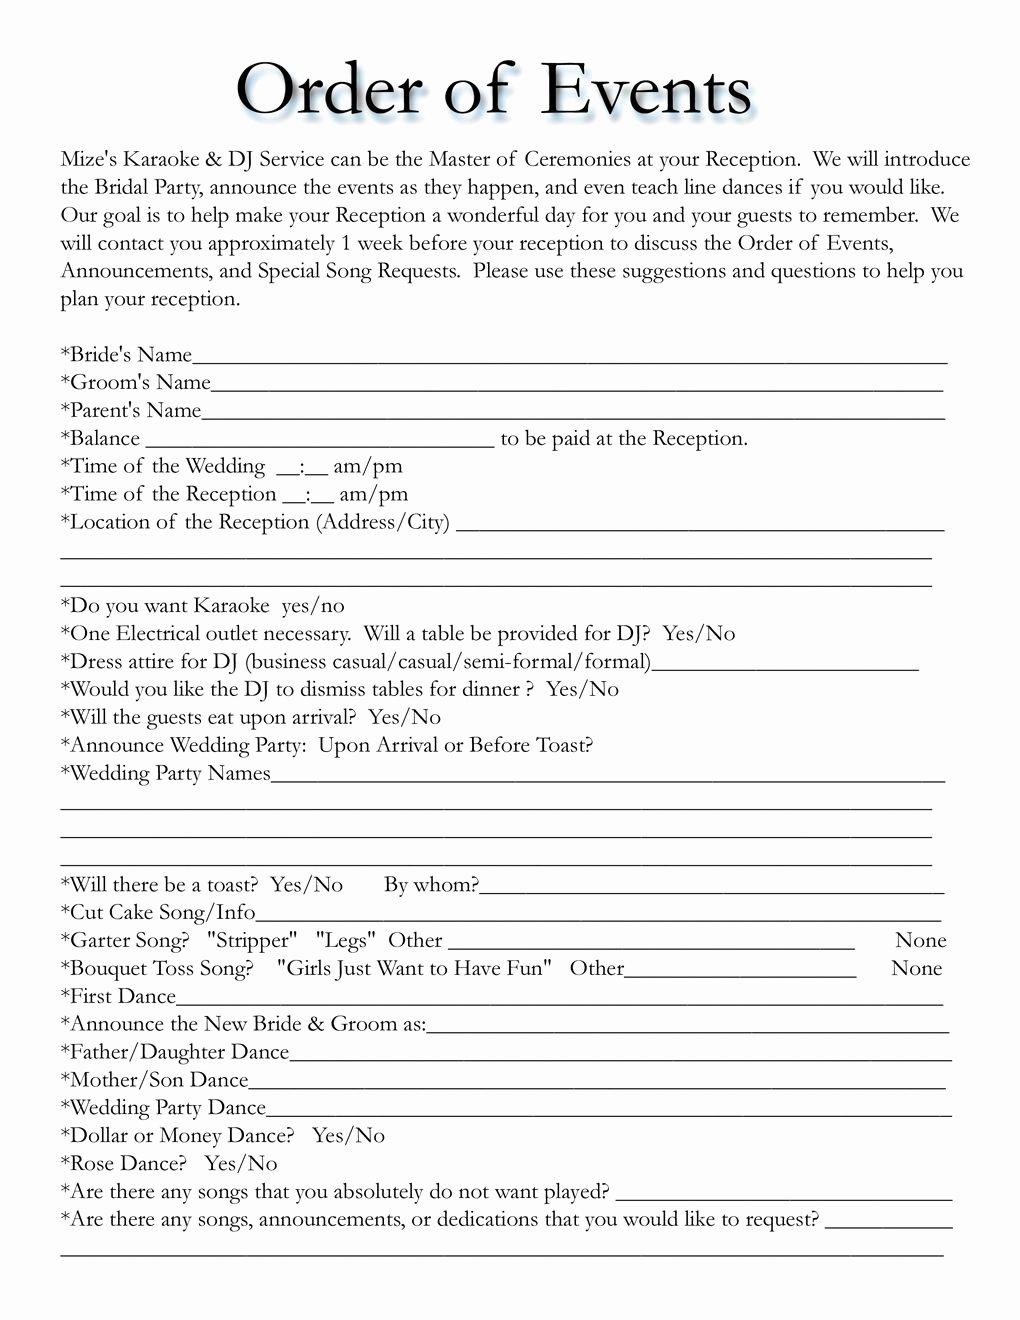 Free Wedding Itinerary Template Fresh Wedding Itinerary Templates Free